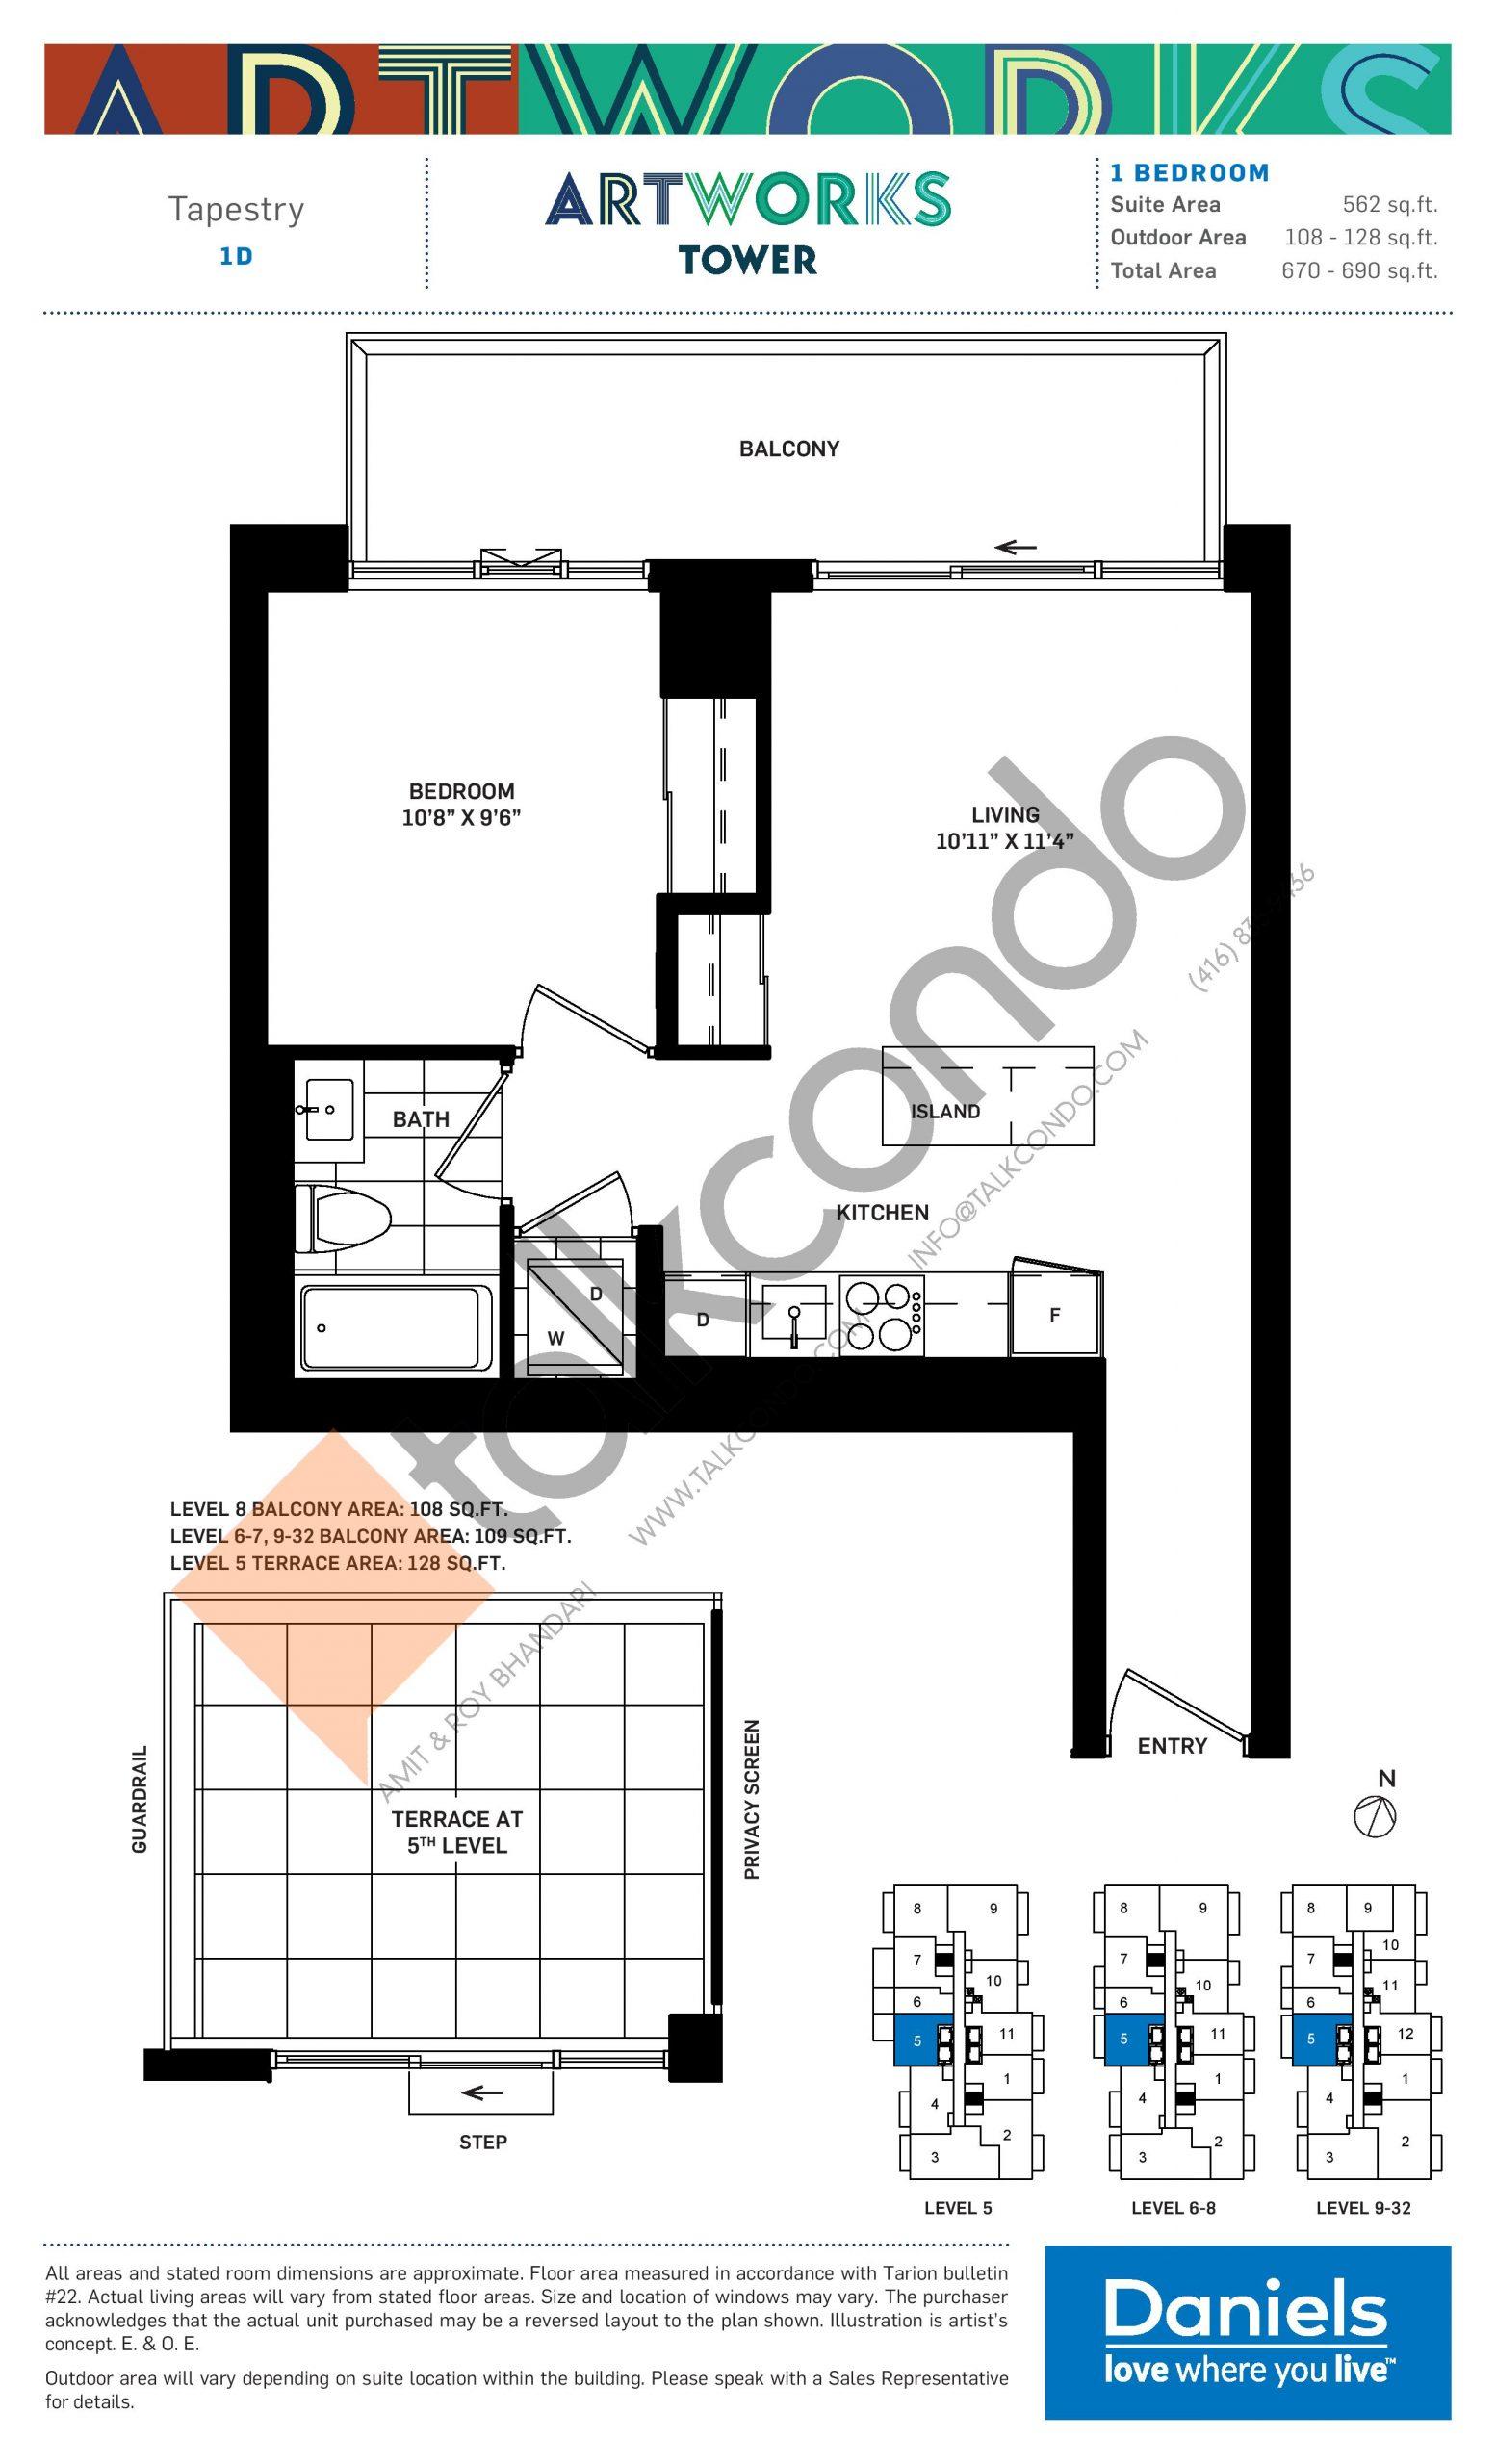 Tapestry Floor Plan at Artworks Tower Condos - 562 sq.ft